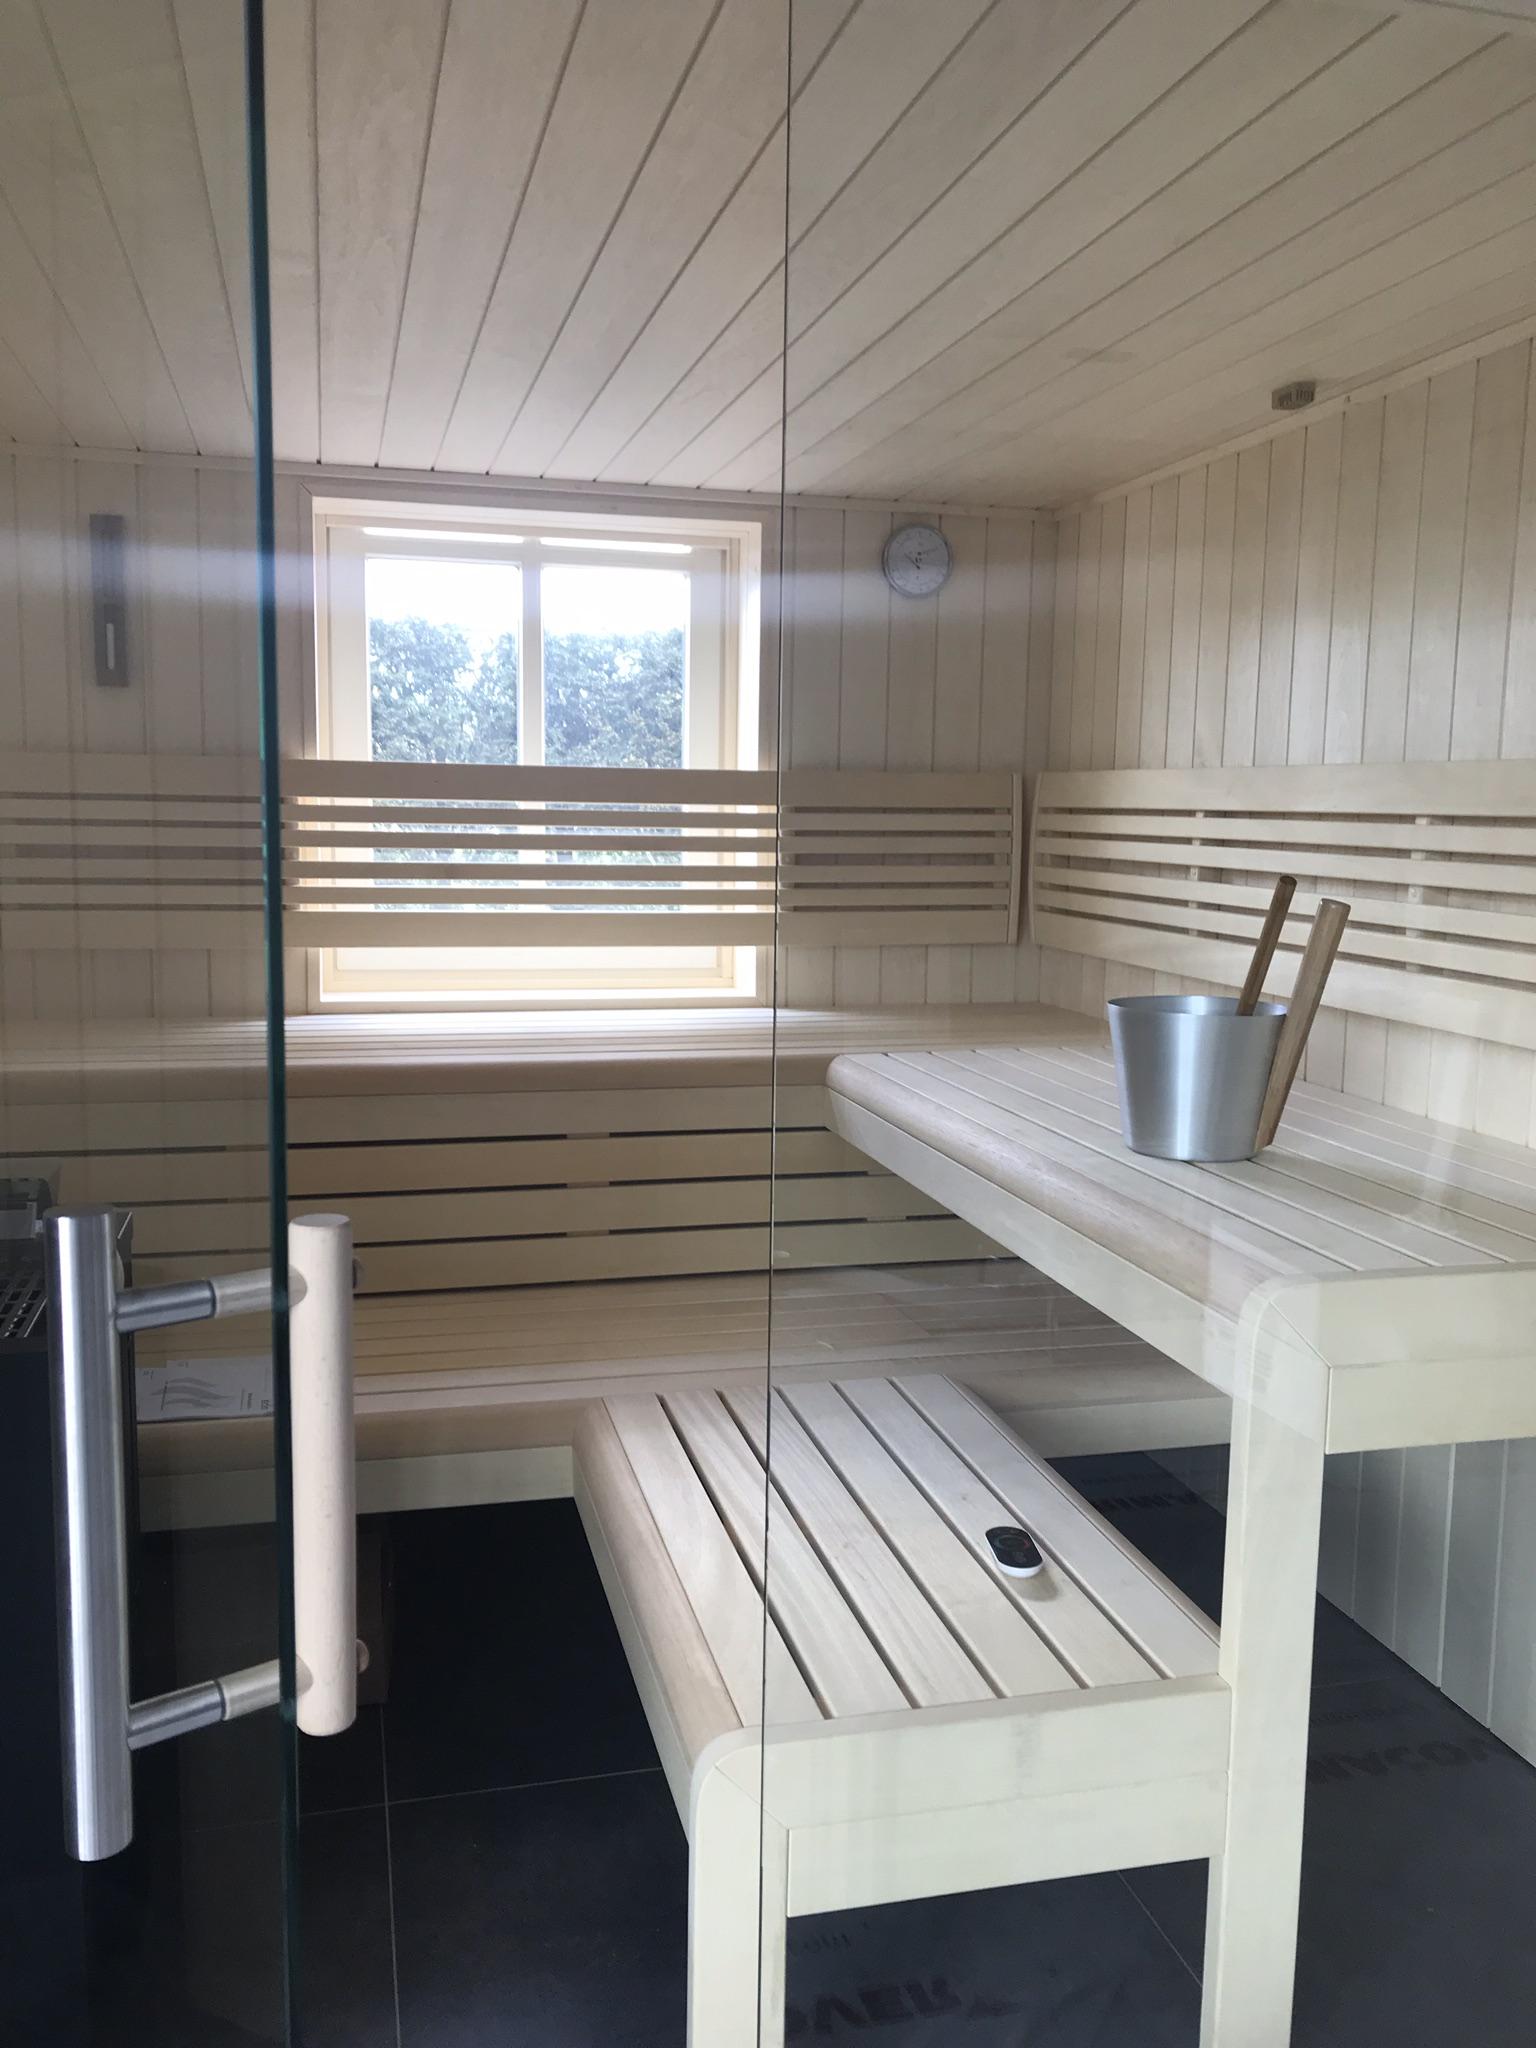 Sauna Project By Artom Bugo At Coroflot Com: Sauna Projecten